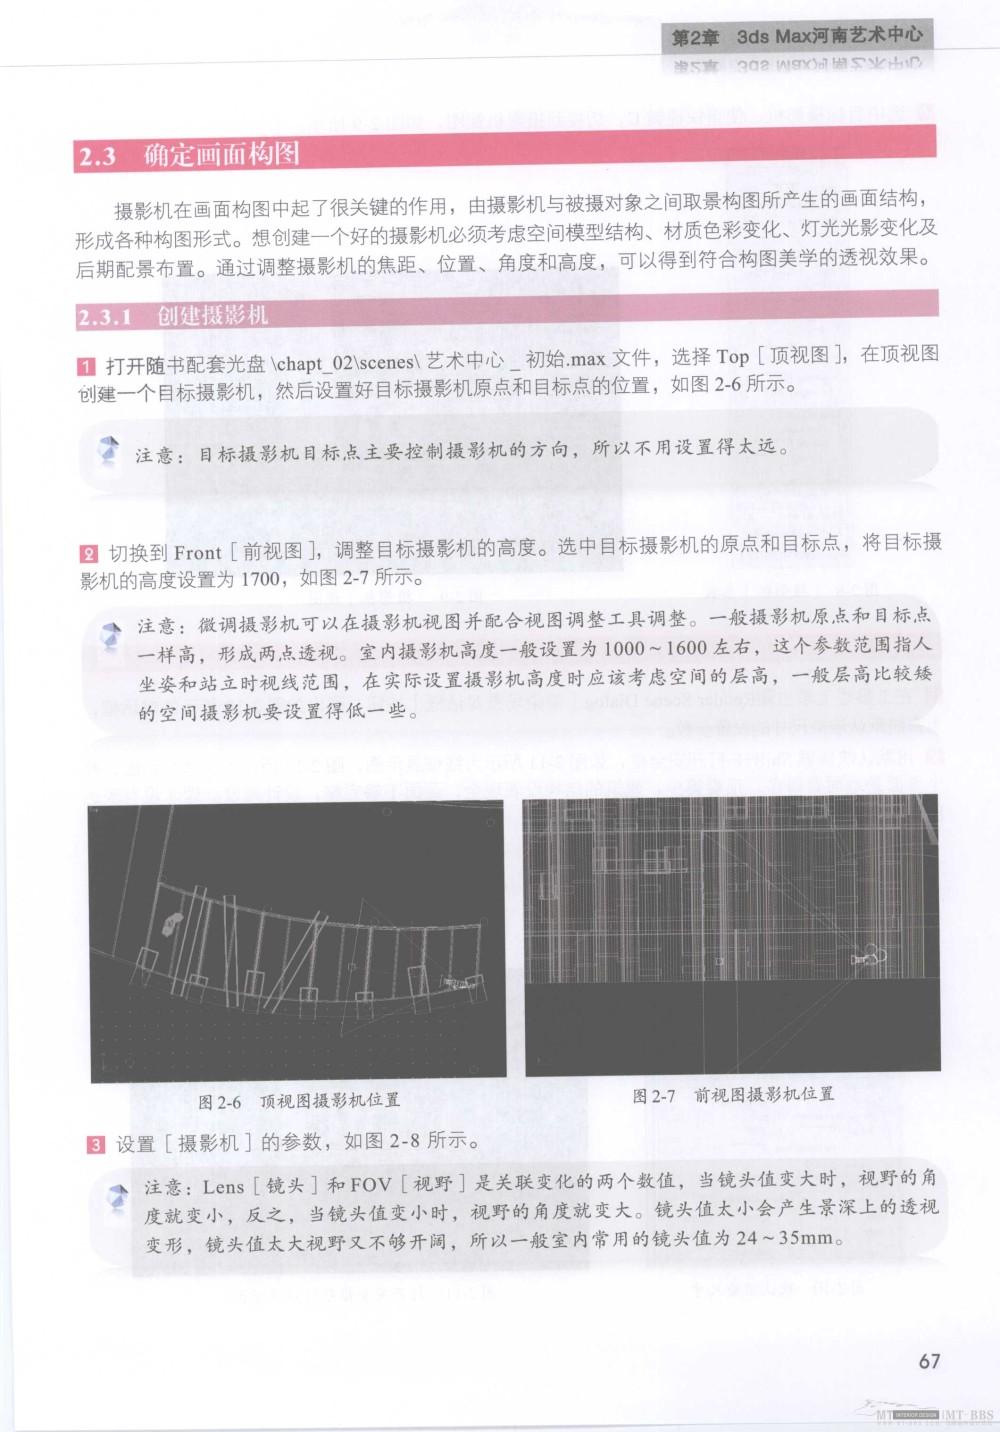 水晶石技法-3ds_Max&VRay室内空间表现_水晶石技法-3ds_Max&VRay室内空间表现_页面_073.jpg